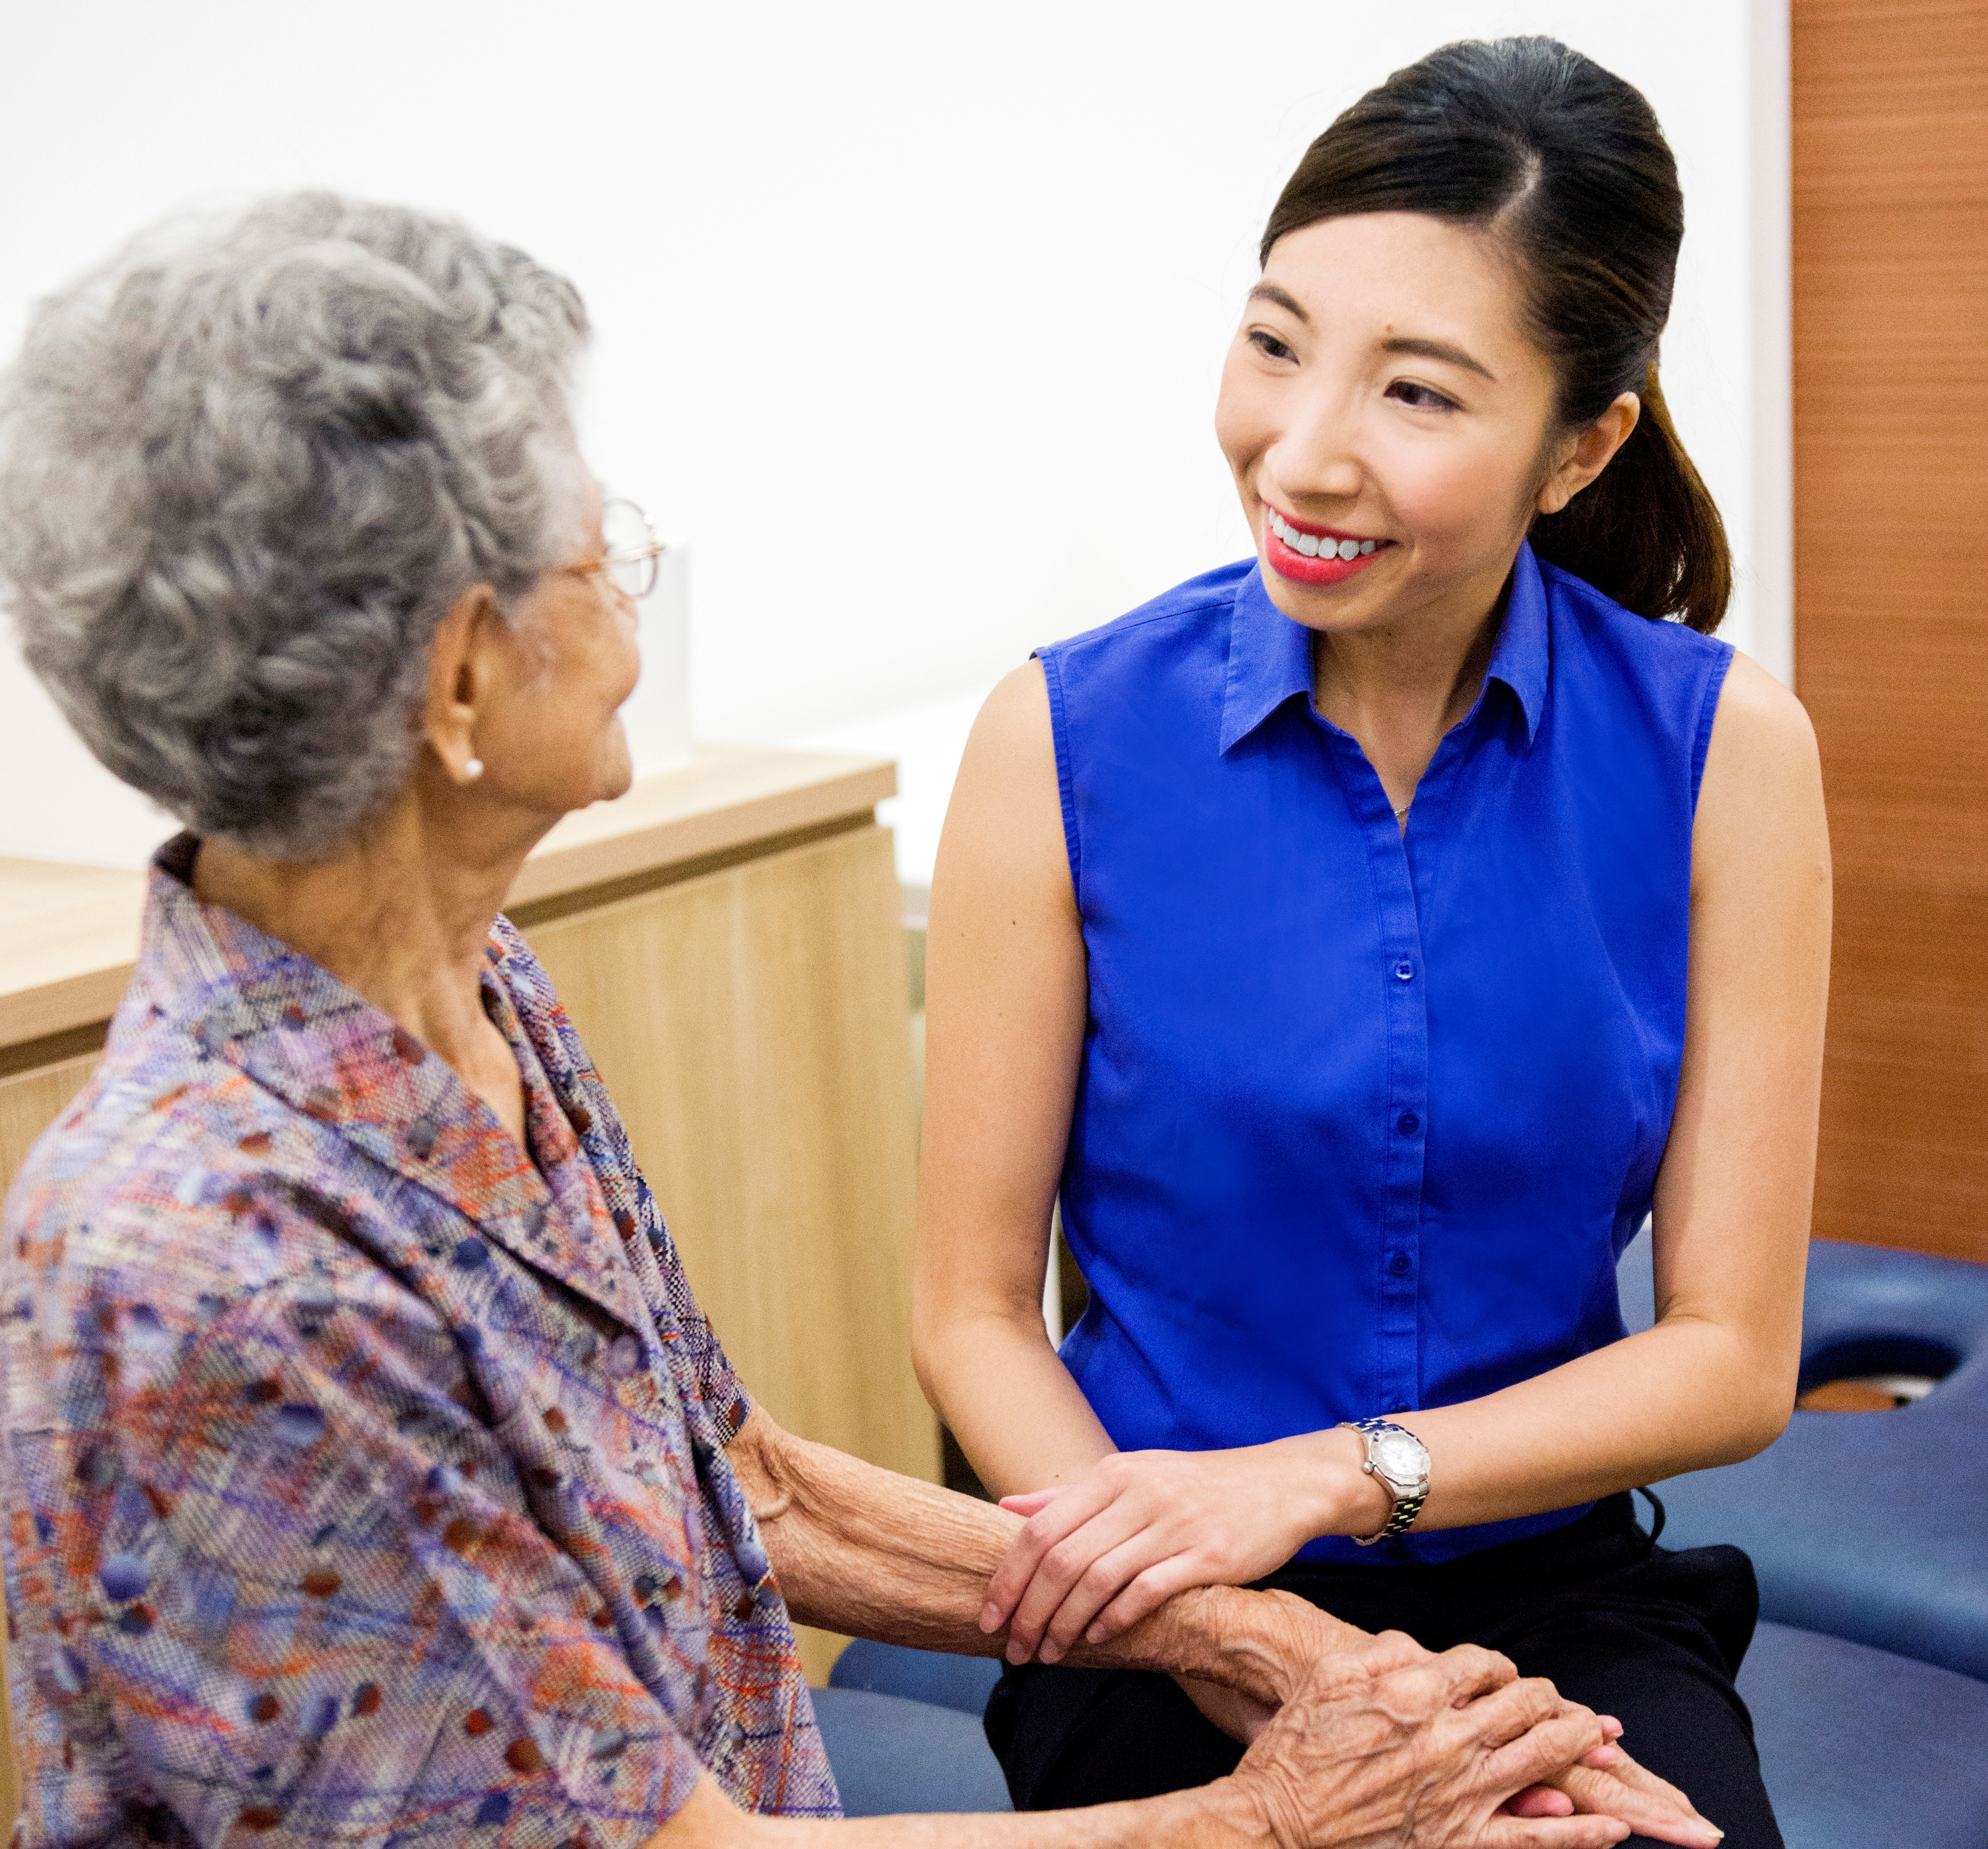 Speech therapist Beatrice Teo